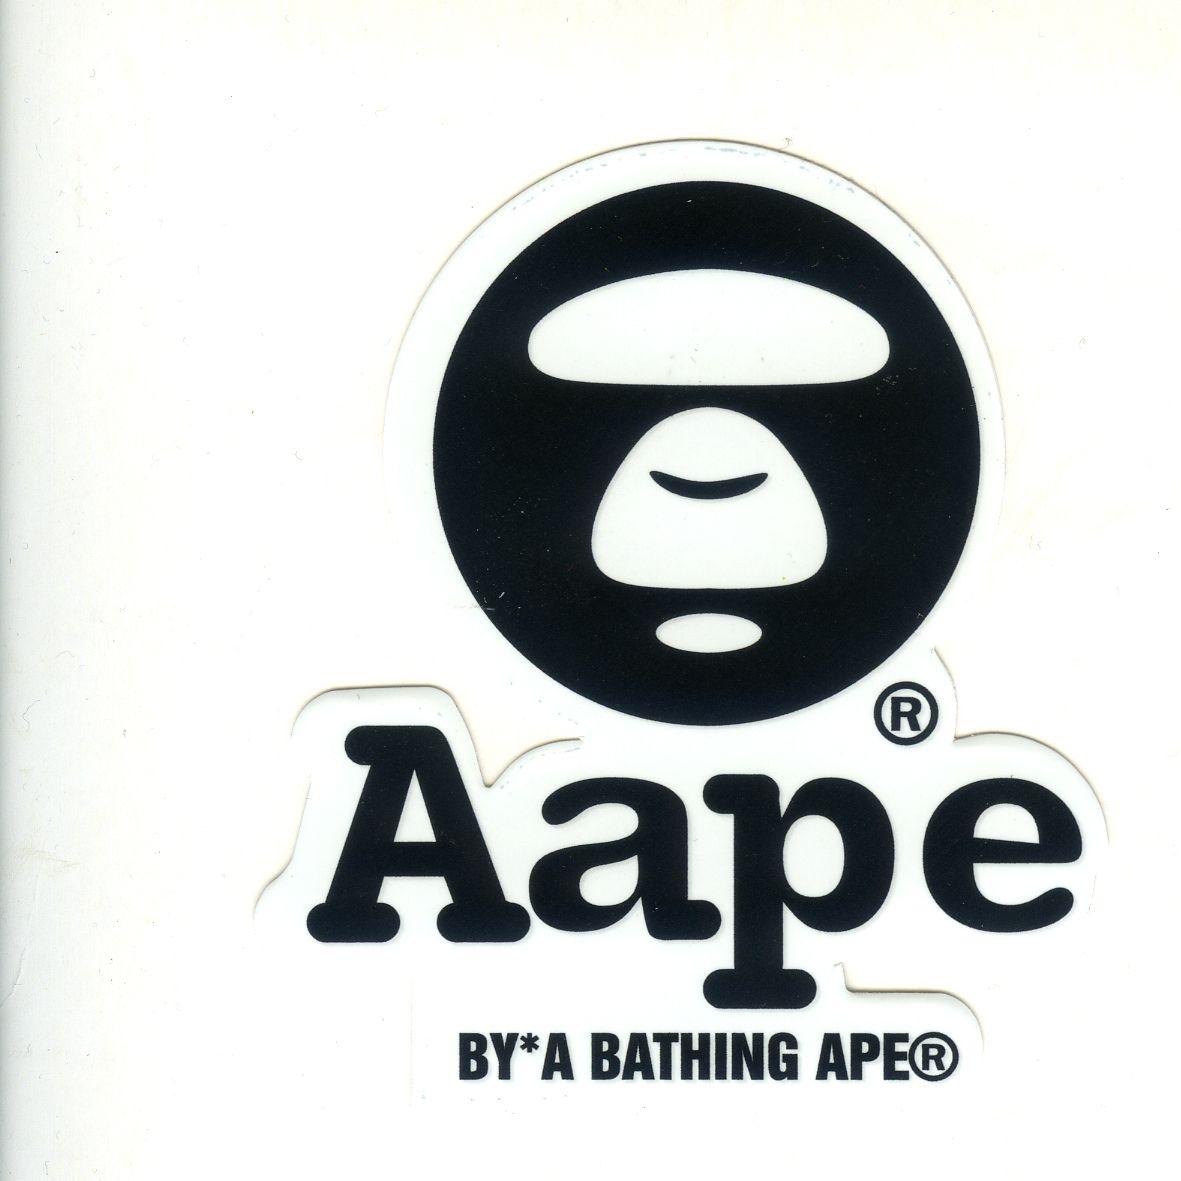 14ca05a5 #1700 AAPE By Bathing Ape Badge Logo , Height 8 cm decal sticker -  DecalStar.com